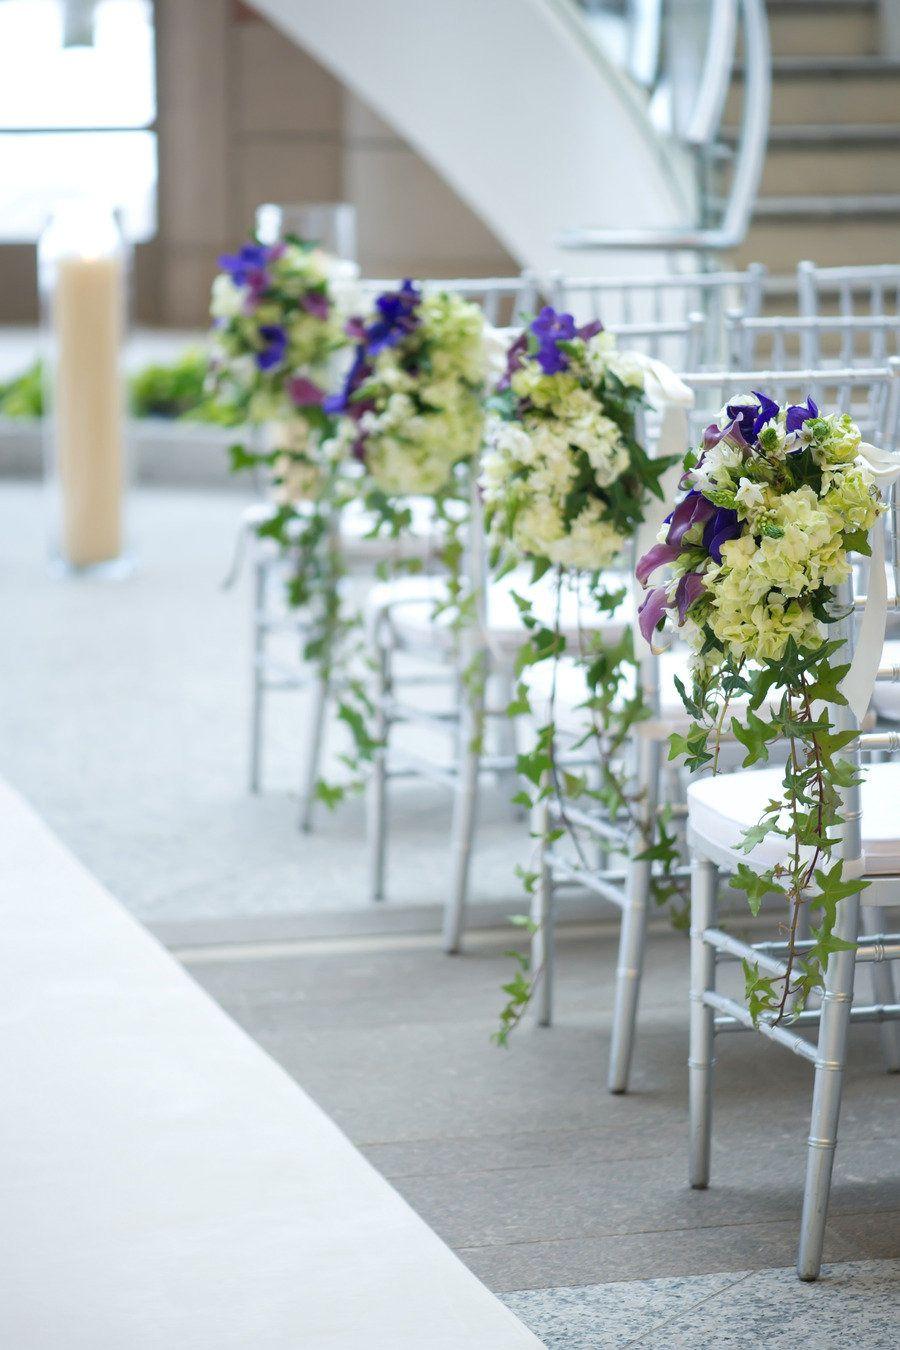 Isle florals. Floral design: Winston Flowers. Photo credit: Leah Haydock.